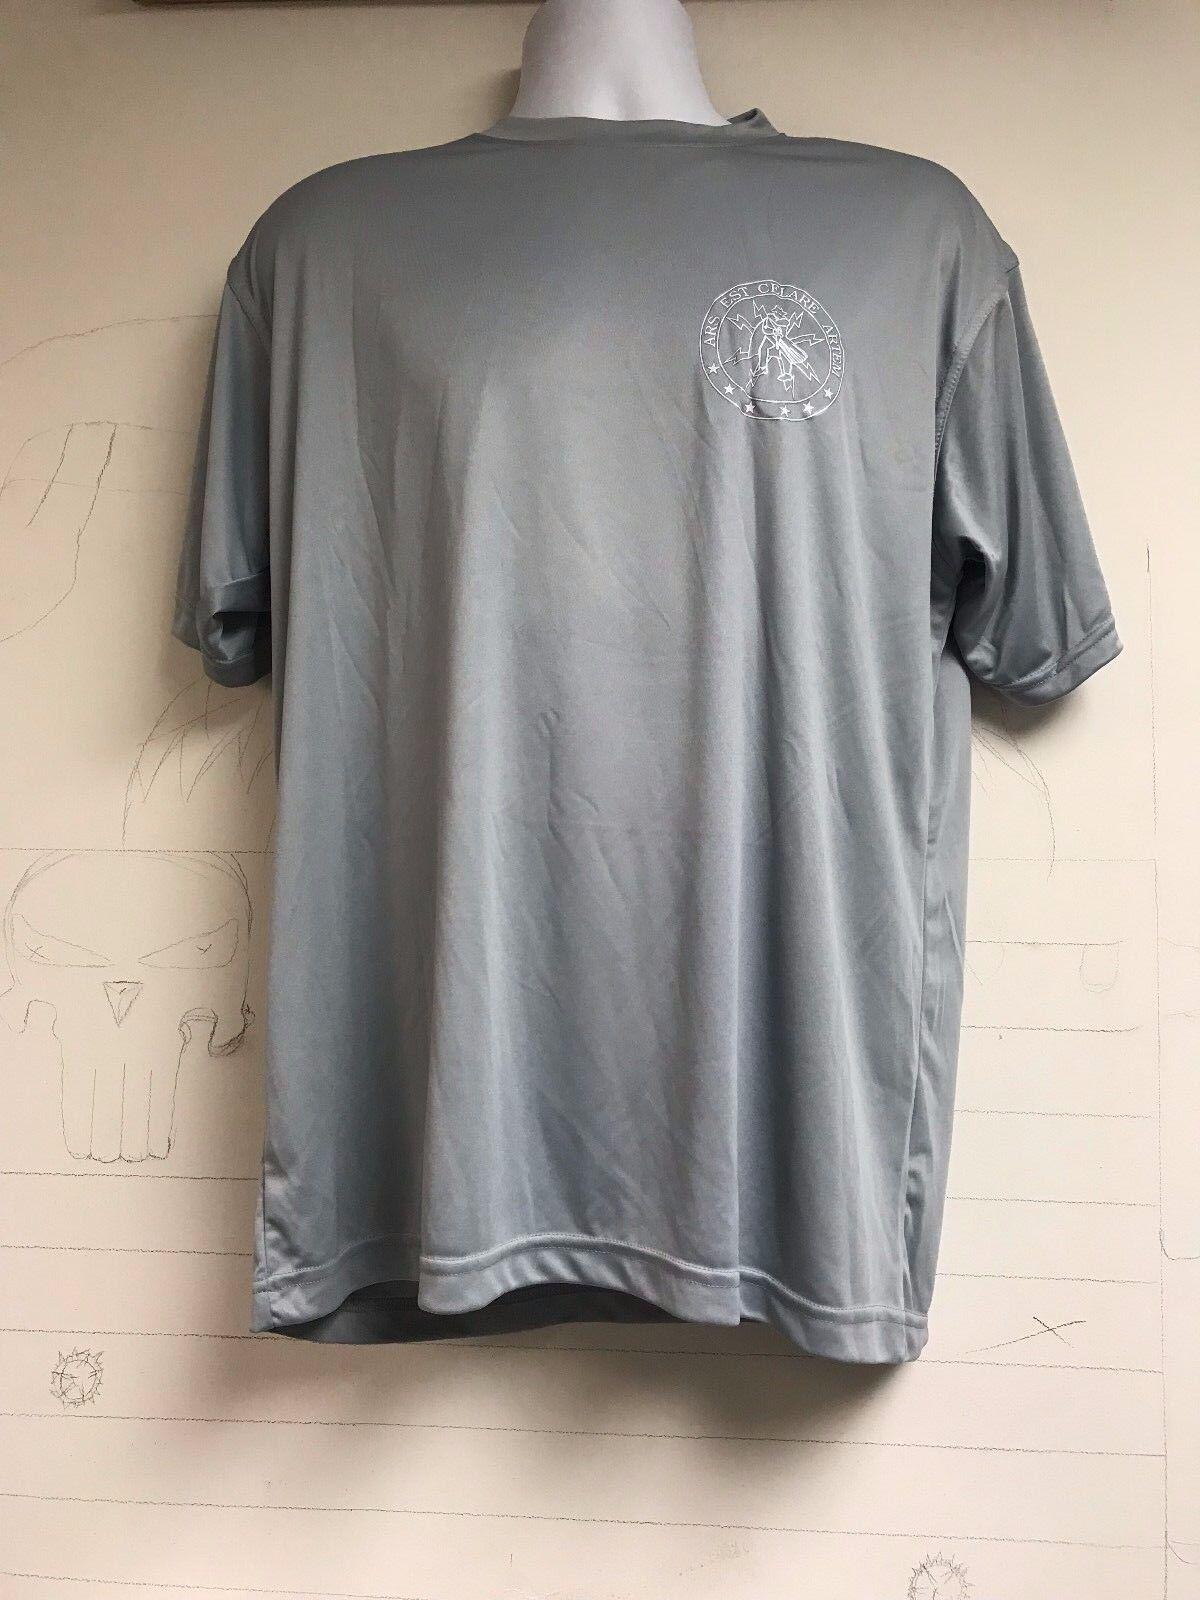 CIA CCG Covert Communications Group Charcoal Gray Short Sleeve T Shirt